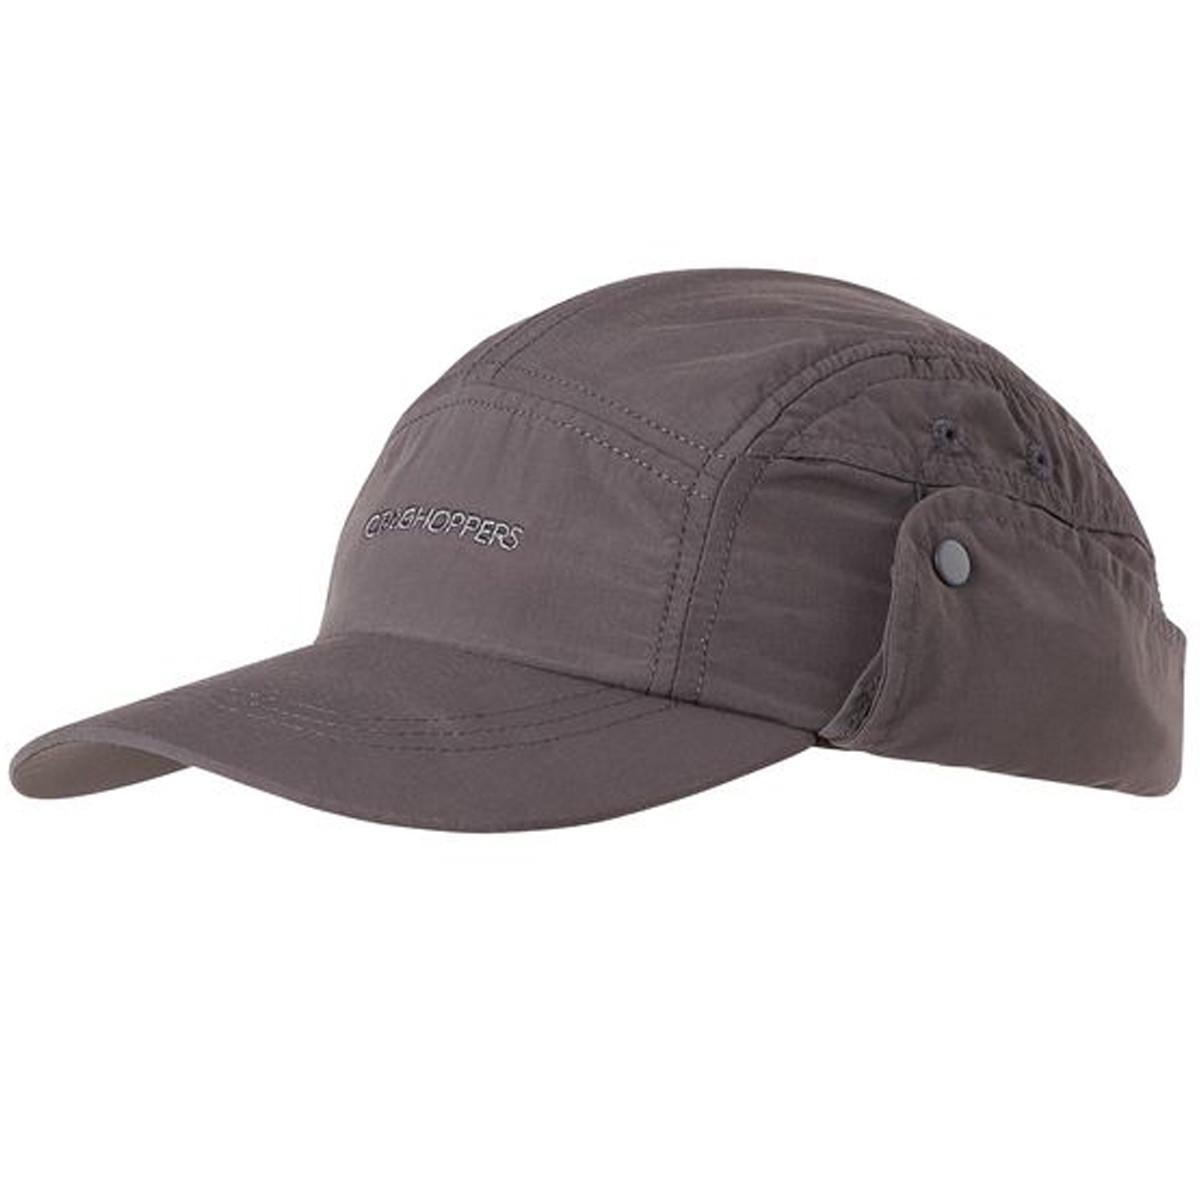 45bc73ccc52 Craghoppers Unisex 2018 NL Desert Hat